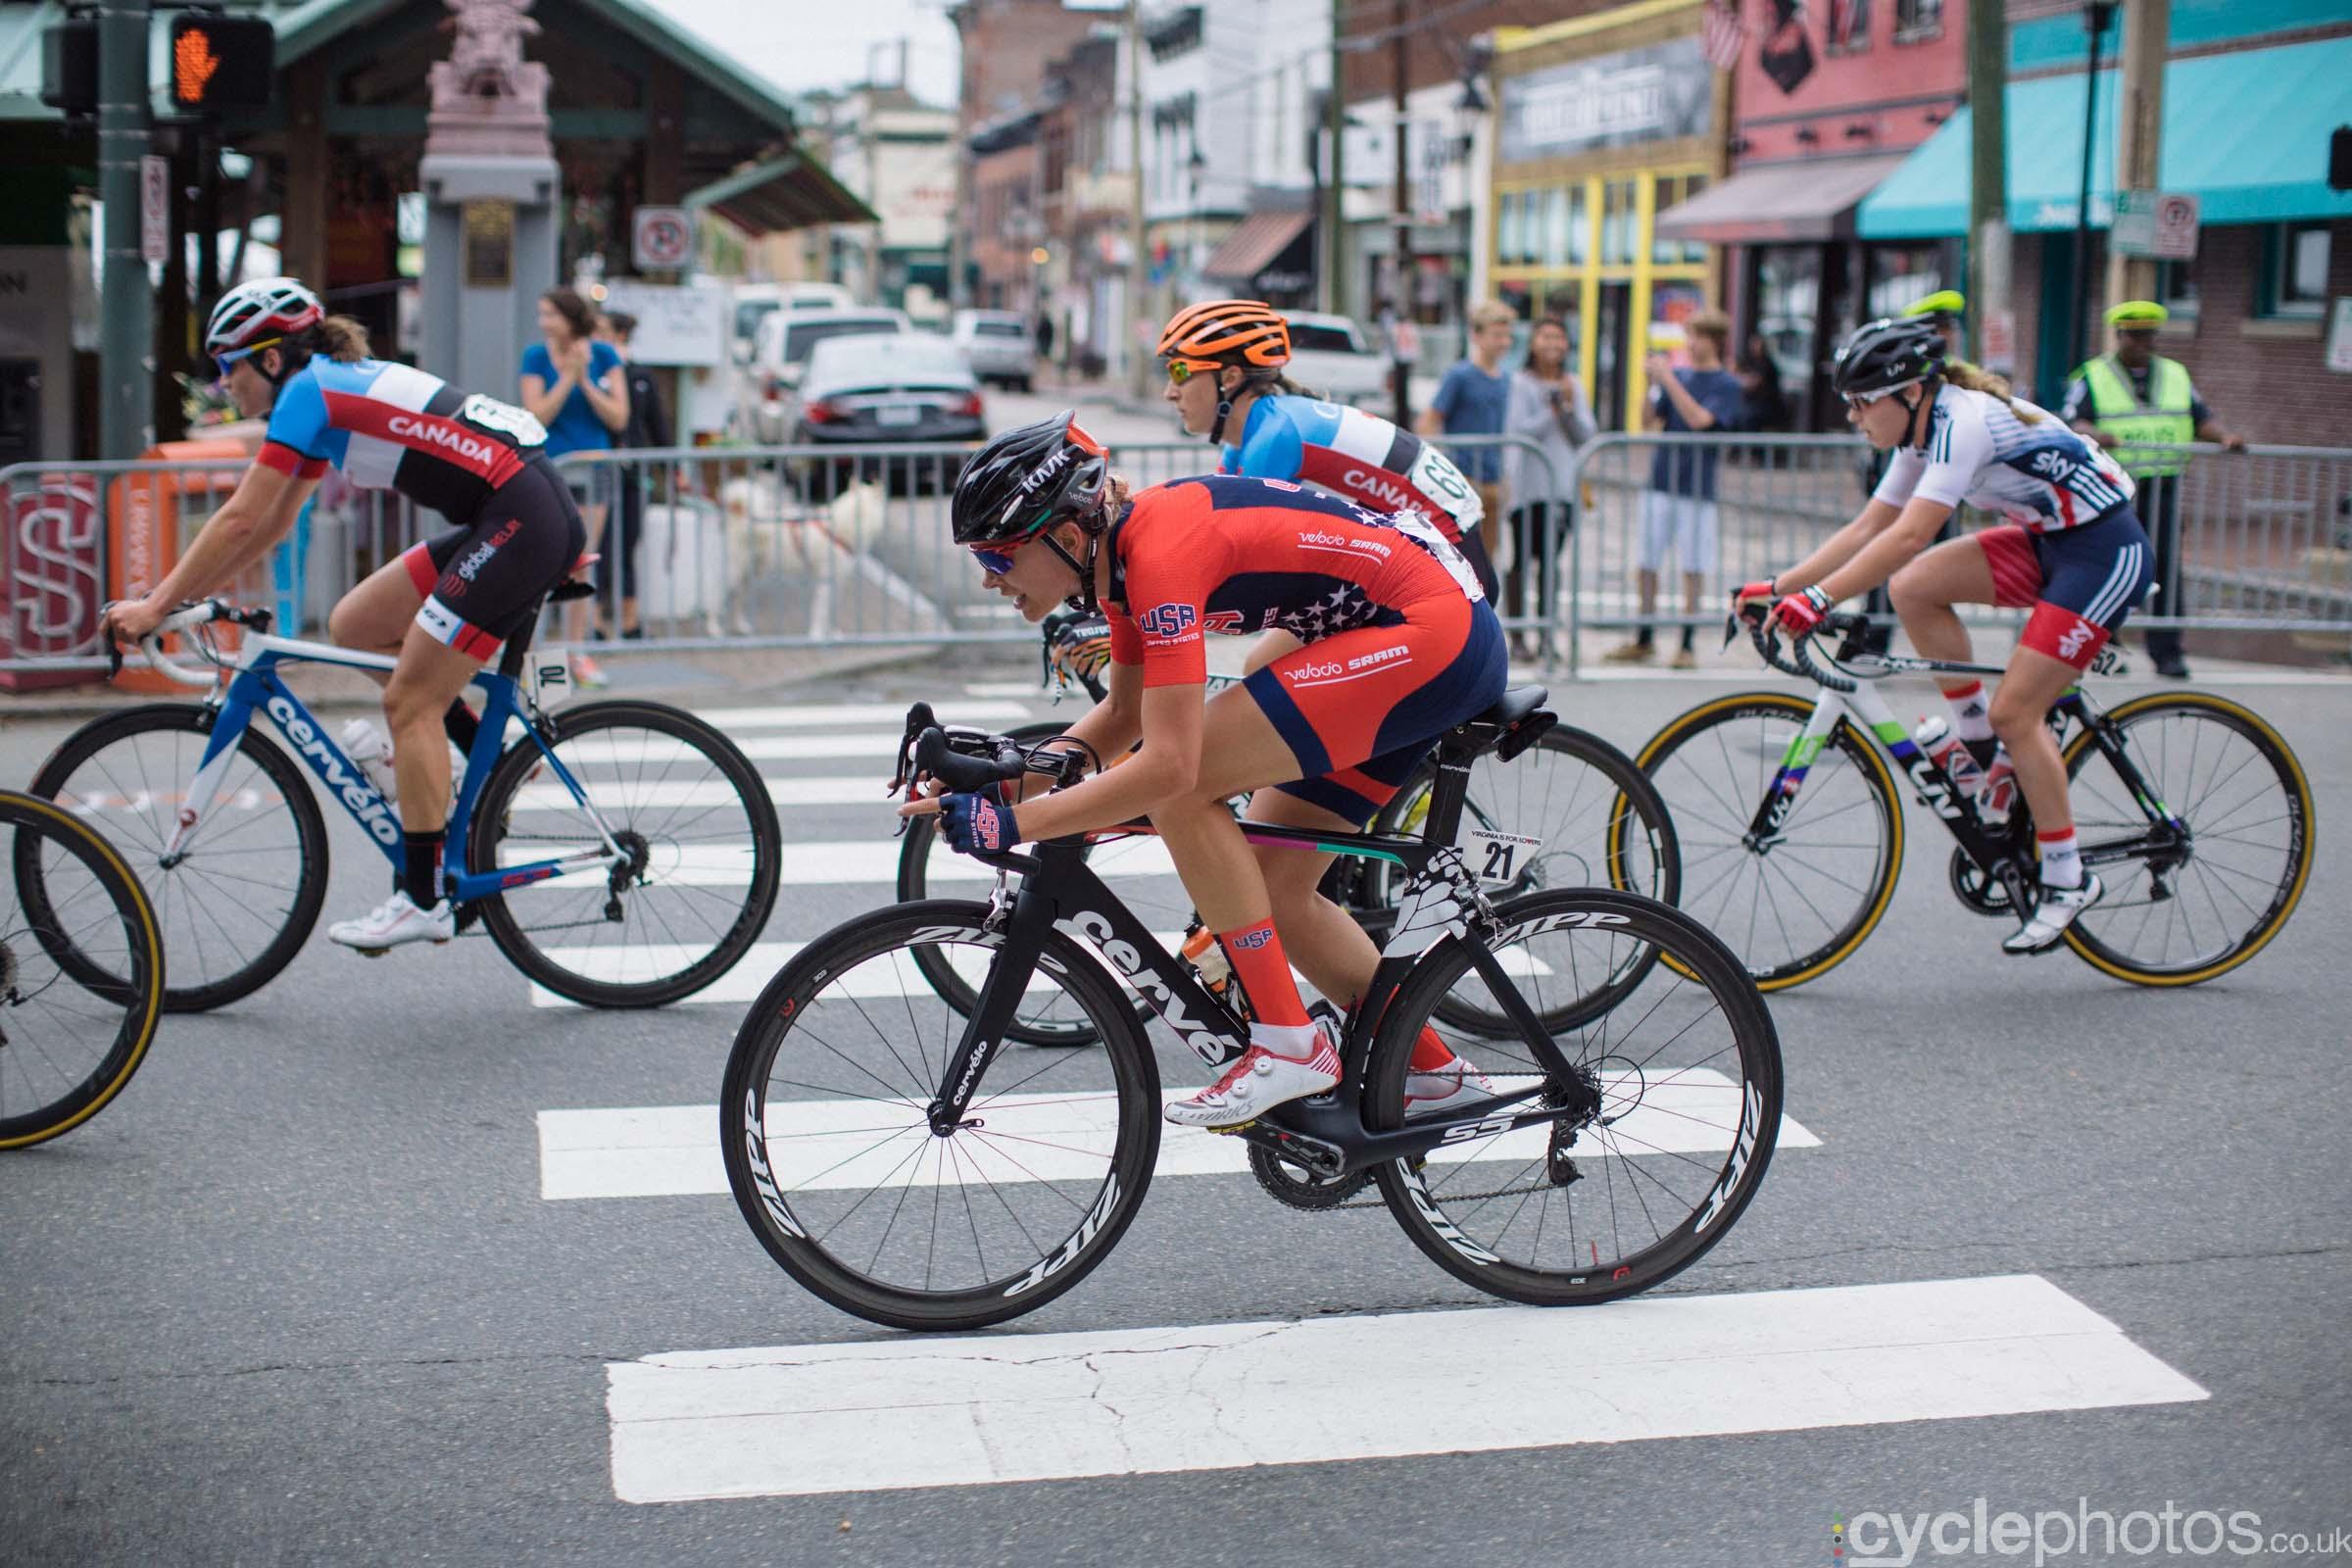 cyclephotos-world-champs-richmond-132135